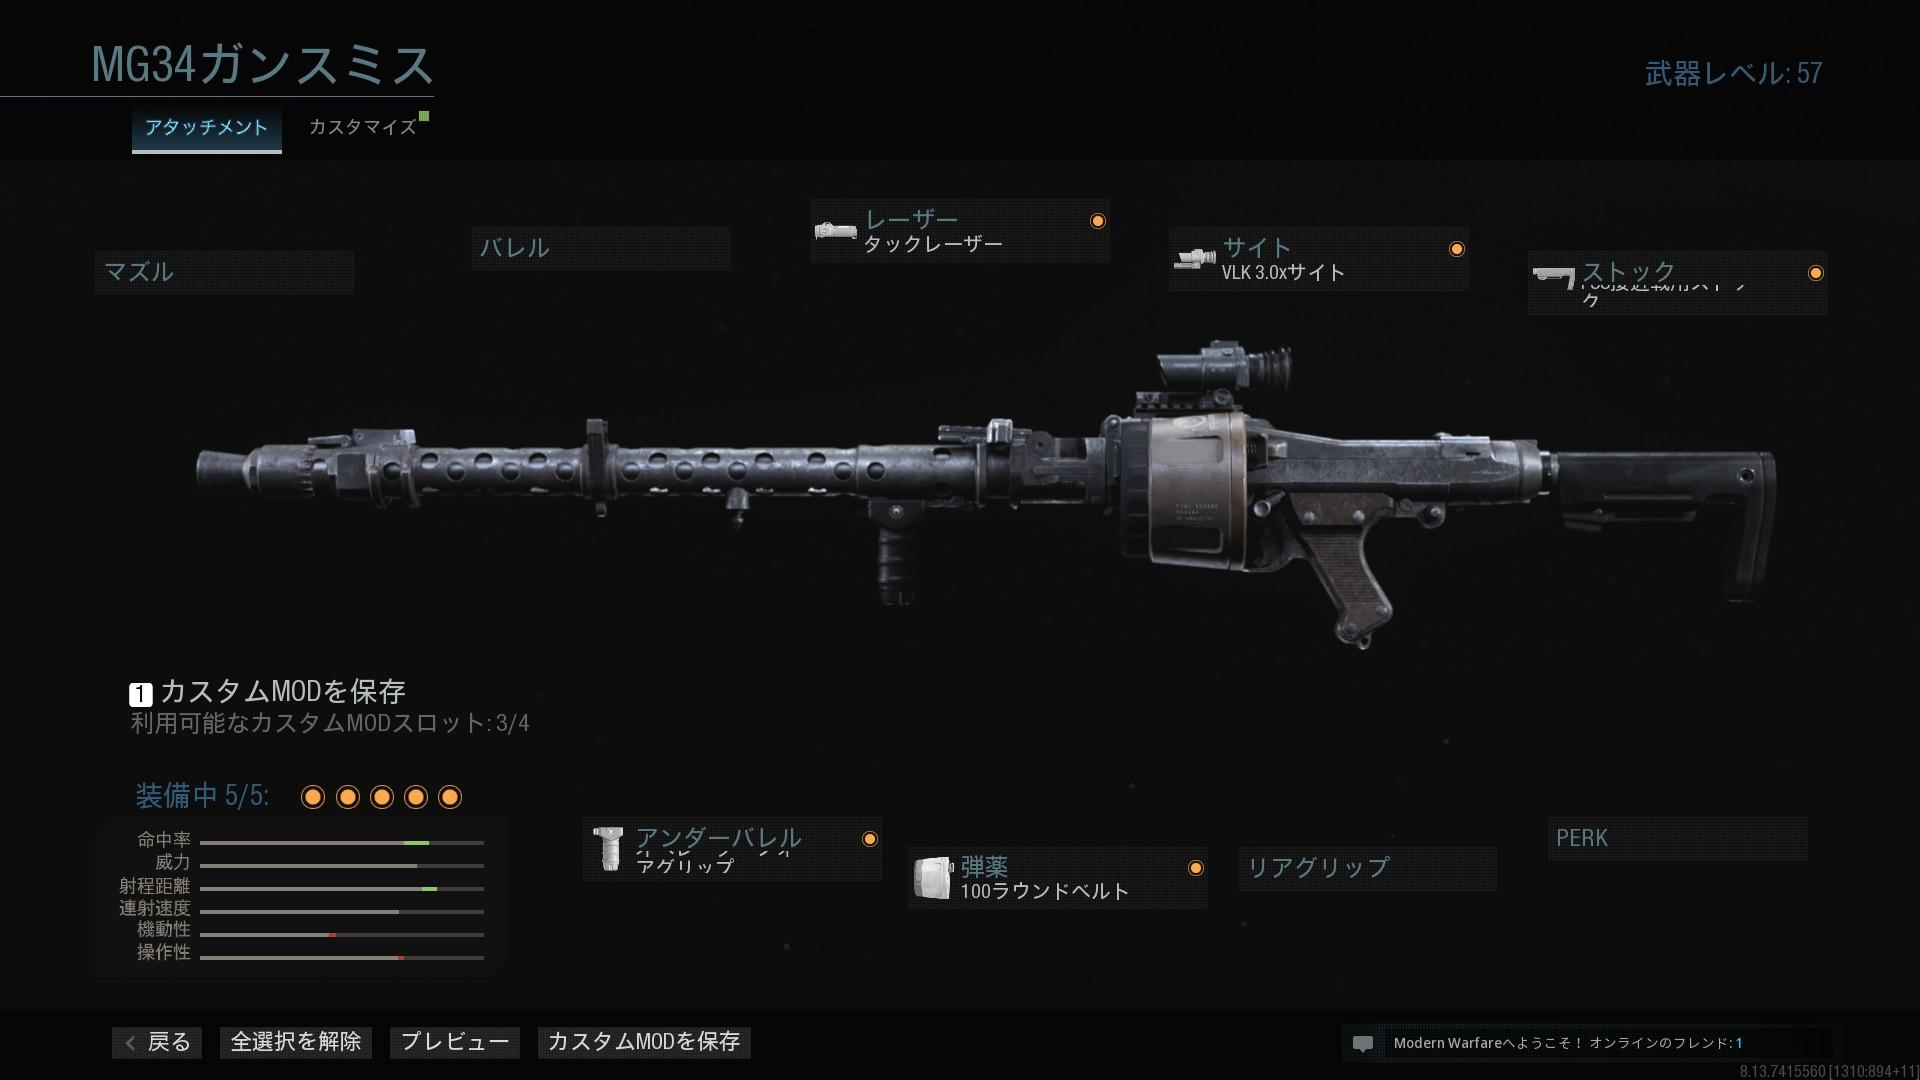 MG34chopsticks.jpg